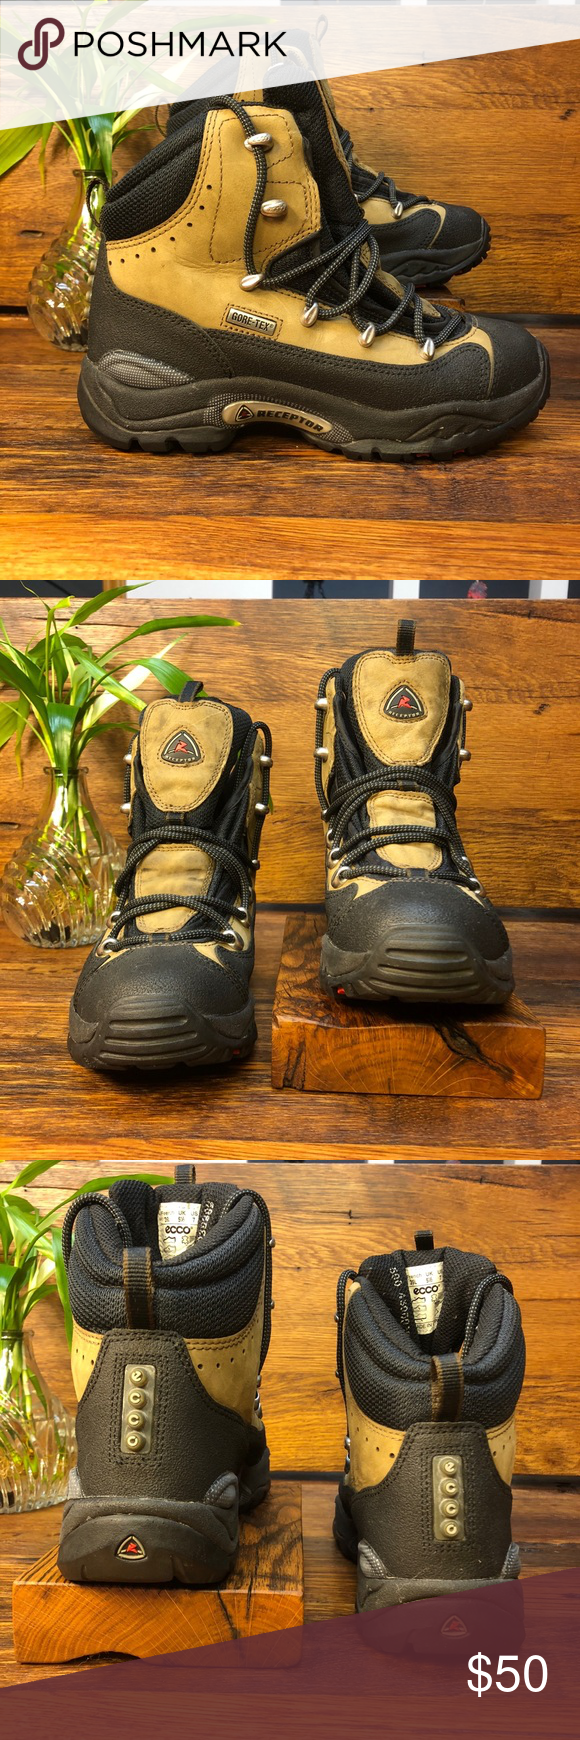 ecco receptor hiking boots,www